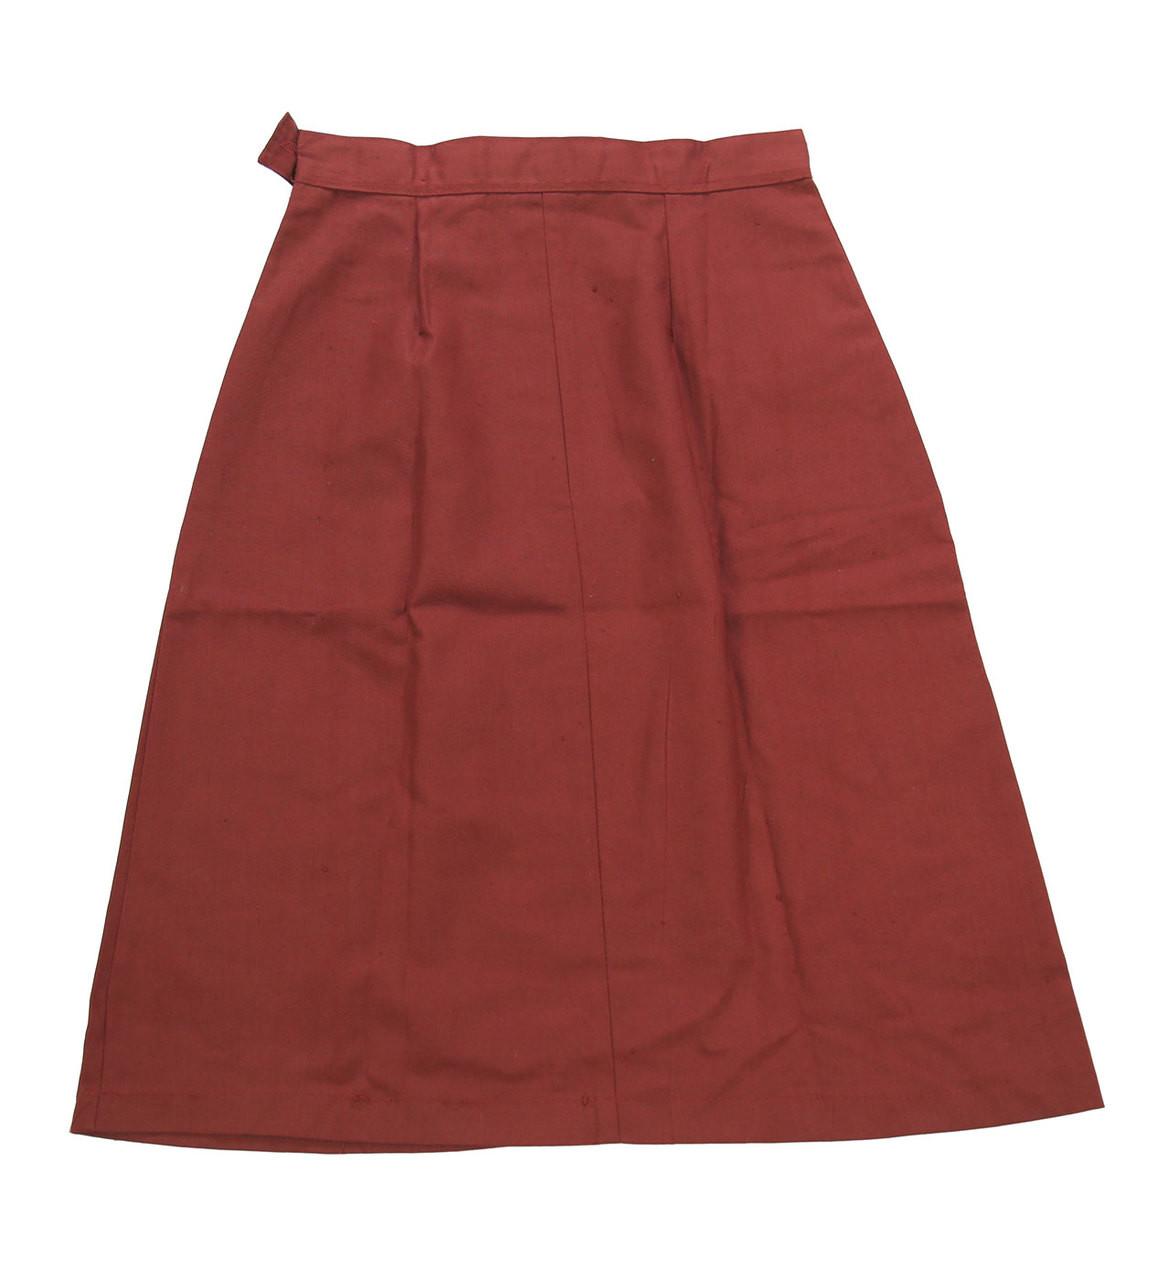 4dbcaef3f Maroon-Girls-Secondary-School-Skirt-4-pcs-Design-Sizes-24-26 ...